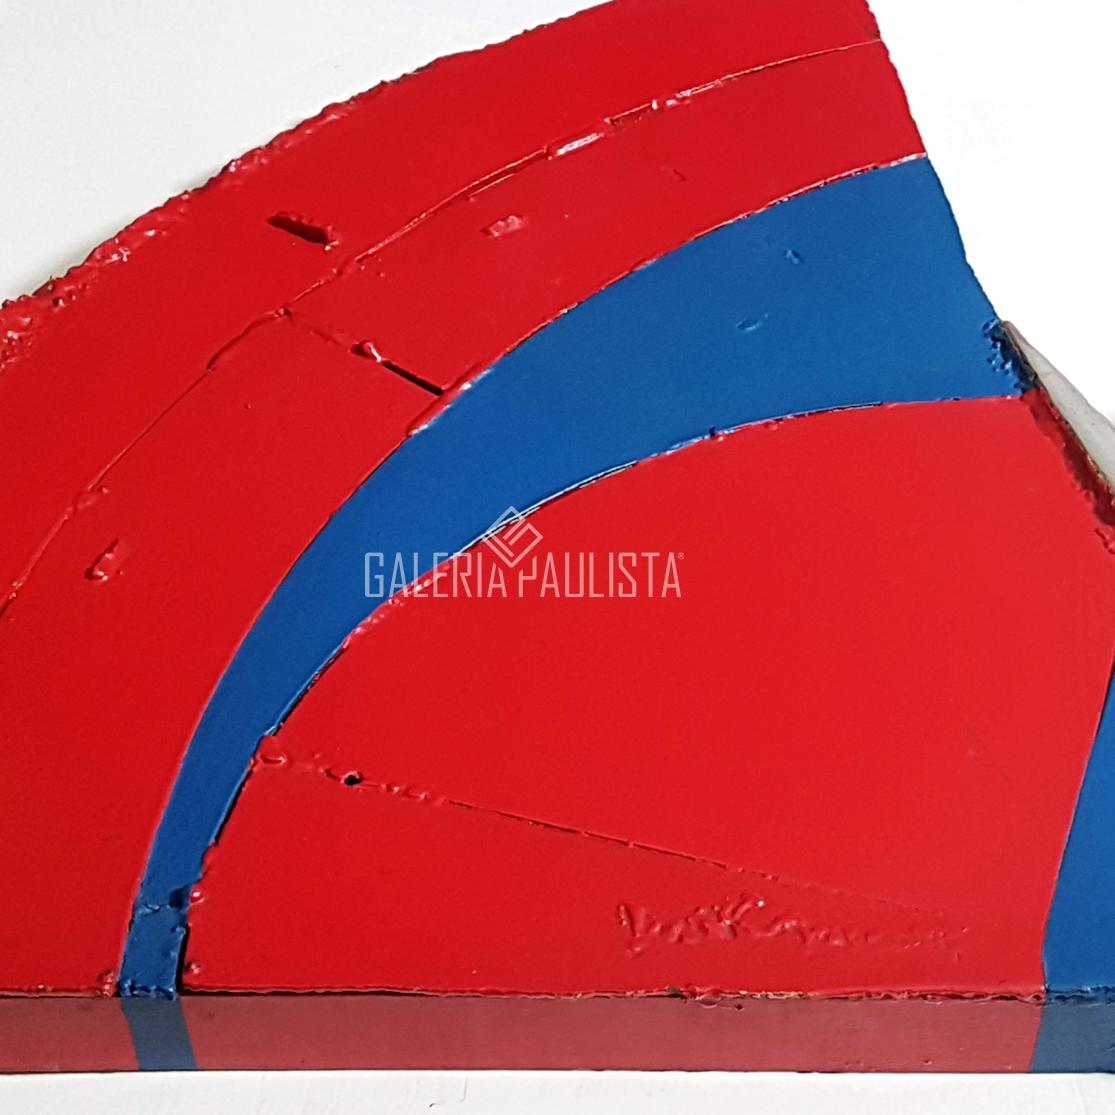 GP-PE11050-Caciporé-Torres-Buterfly-Escultura-Aço-Galeria-Paulista-d